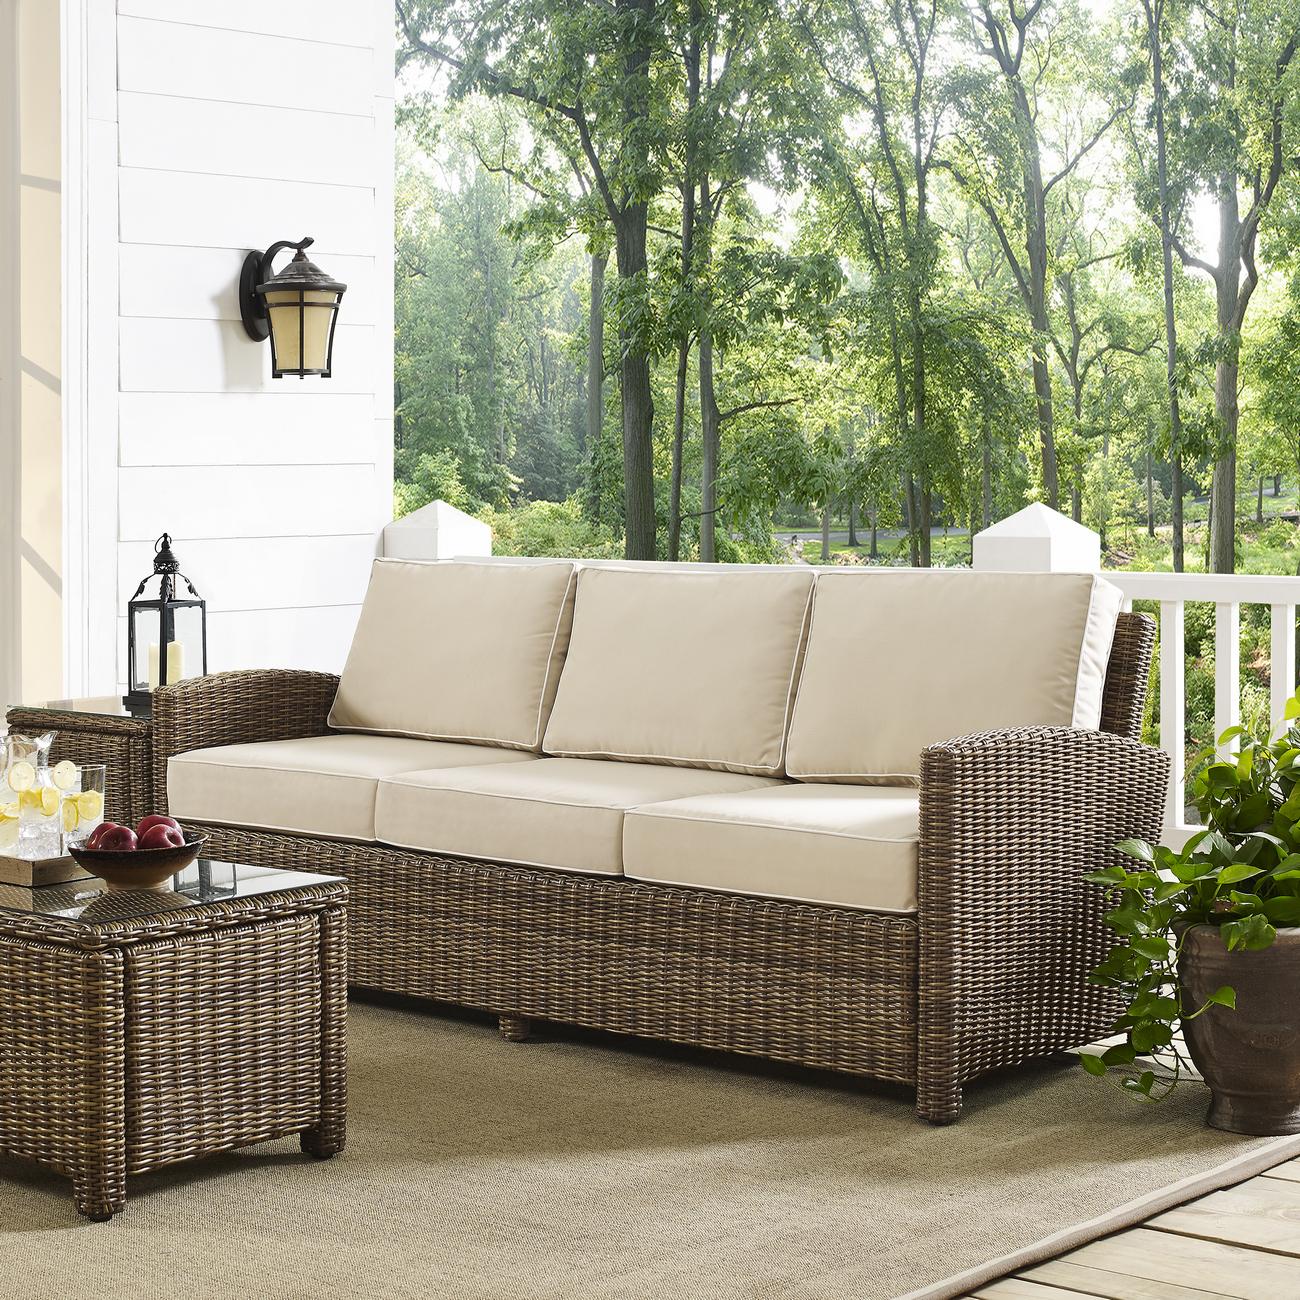 Sofa Sand Cushions